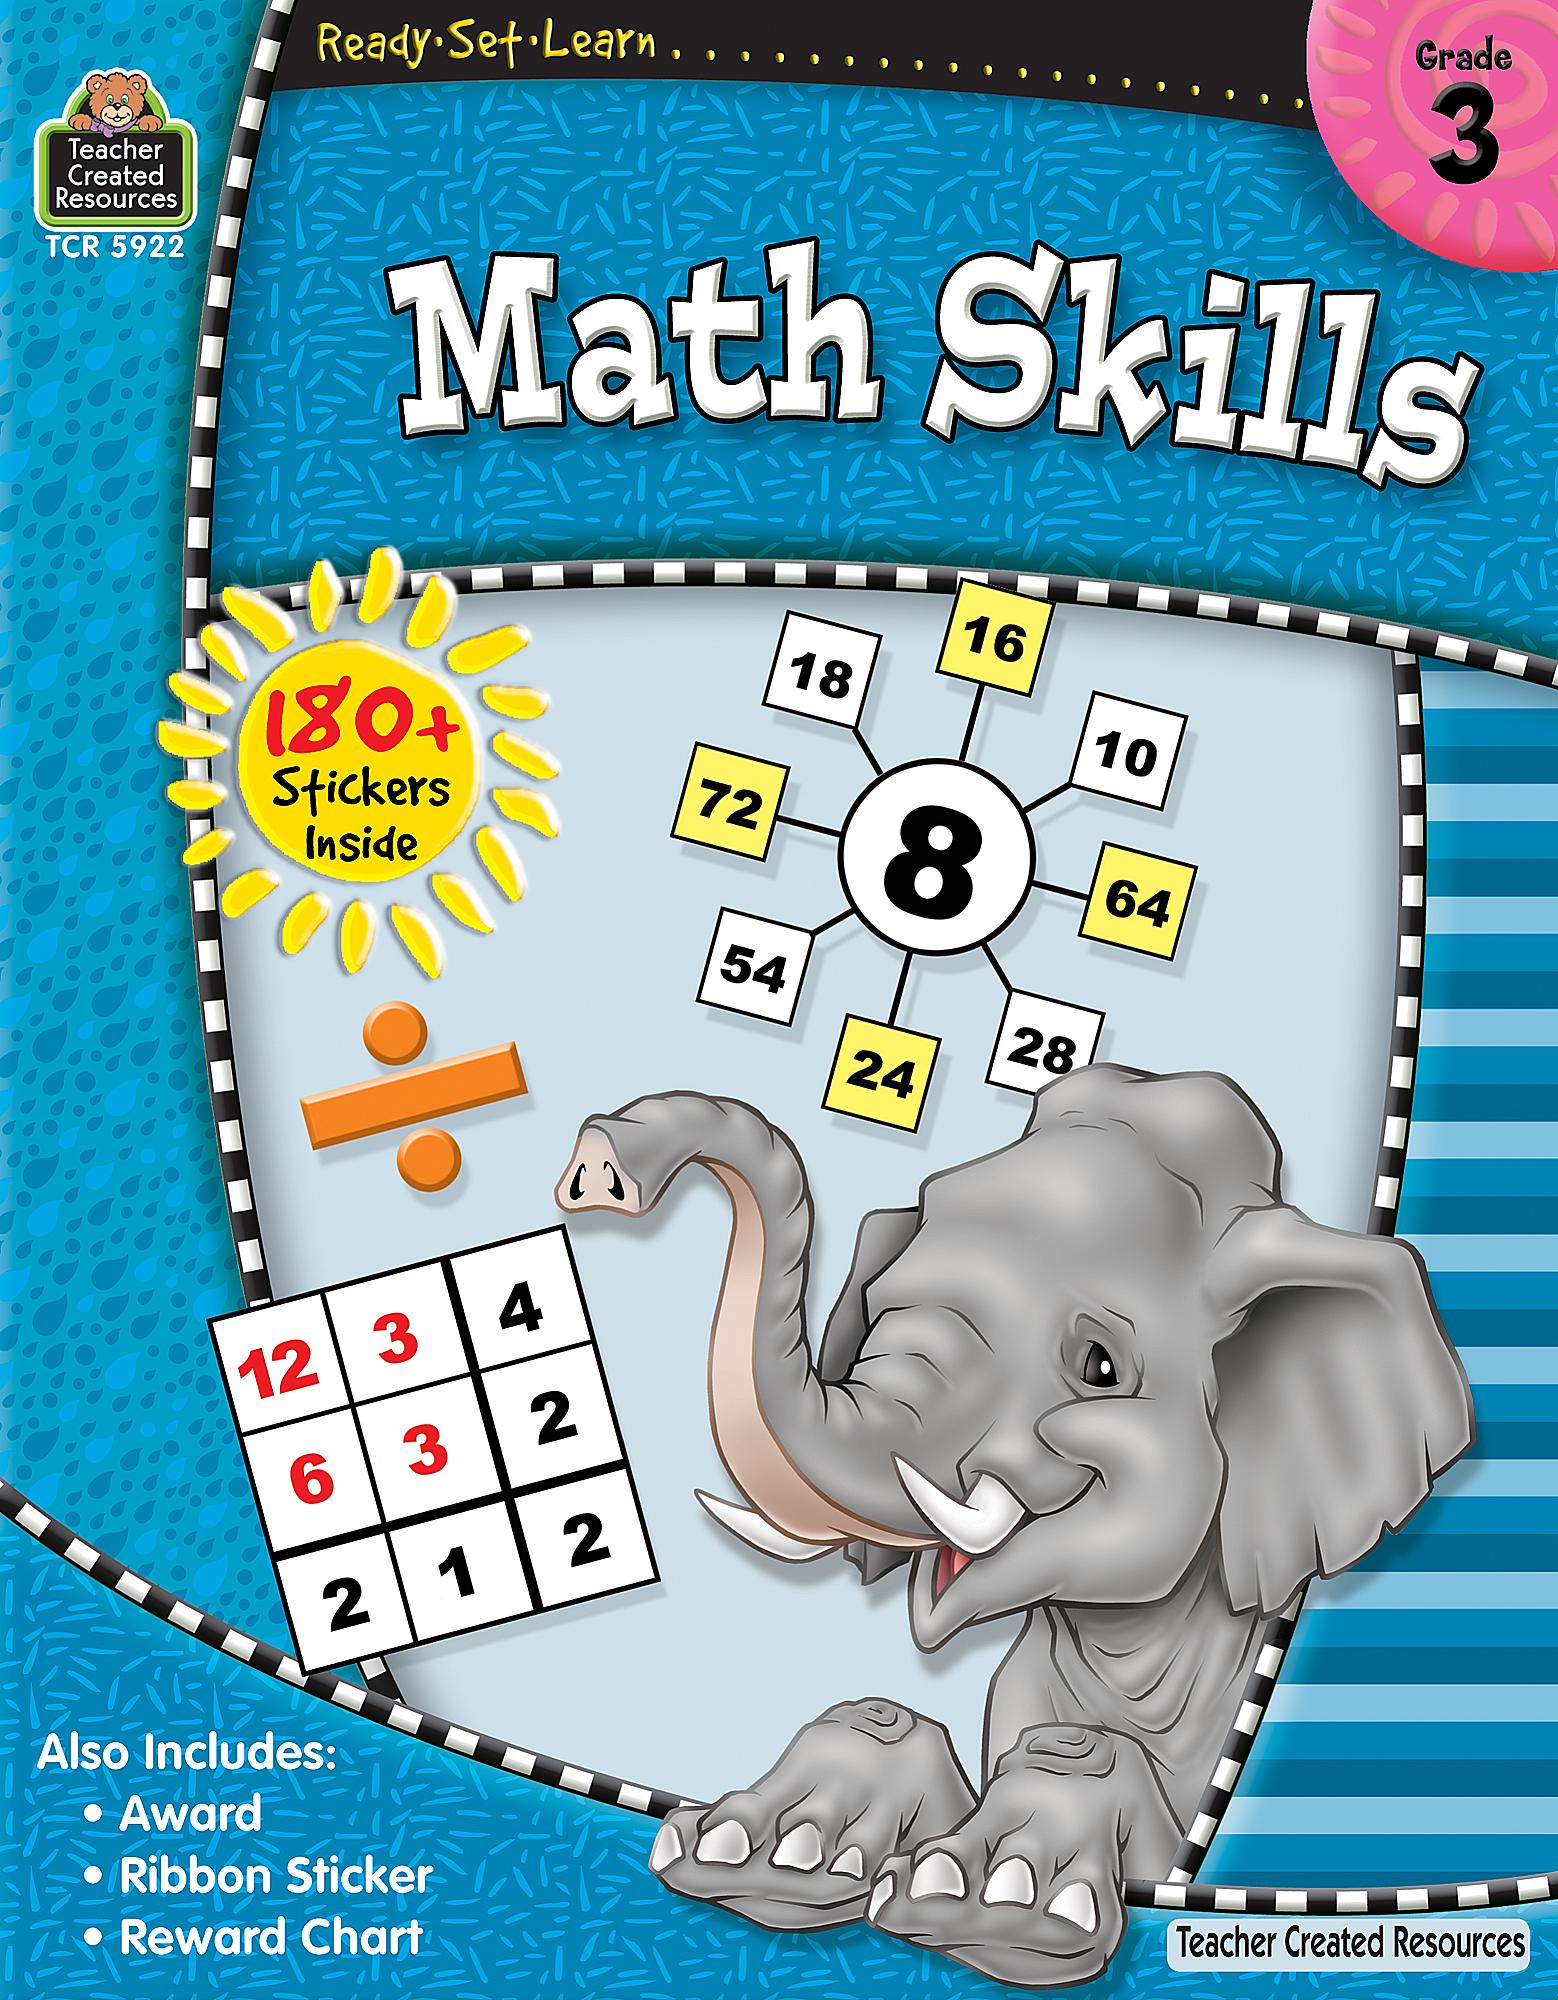 ready-set-learn  math skills grade 3